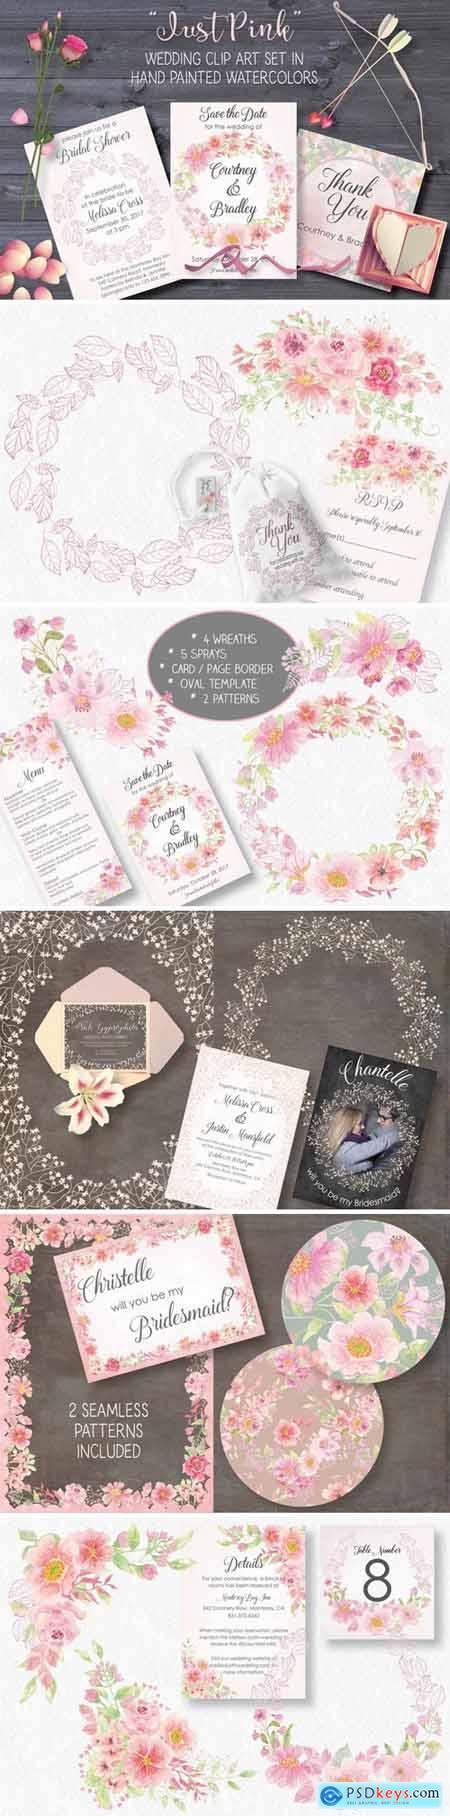 Just Pink Wedding Clip Art Set